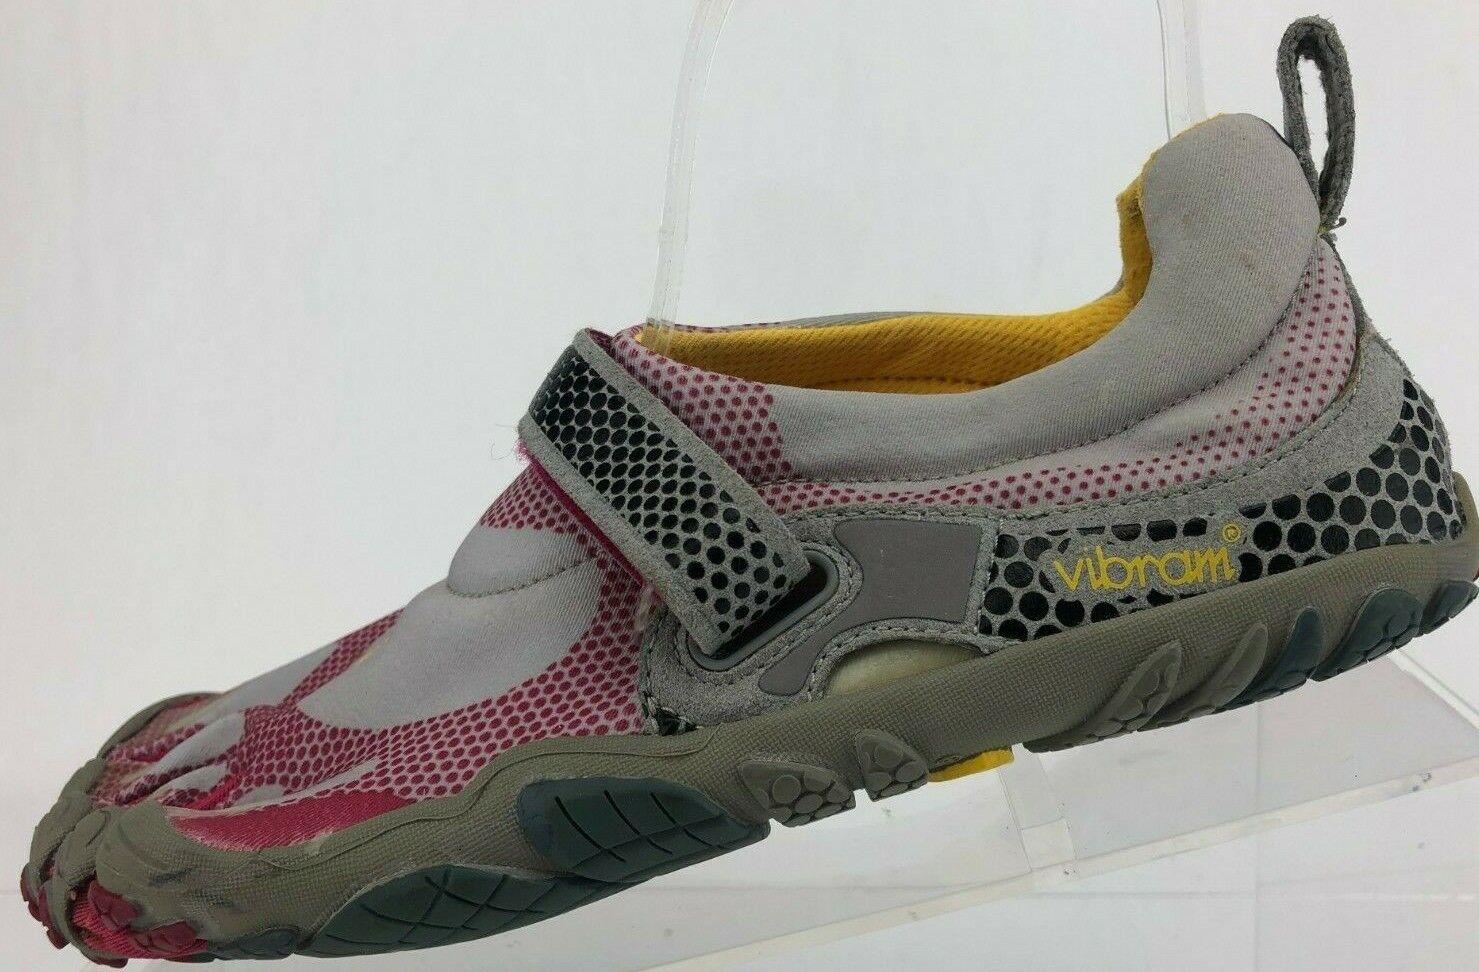 Vibram Five Fingers Bikila Trail Running shoes Barefoot Grey Pink Women 38 7,7.5